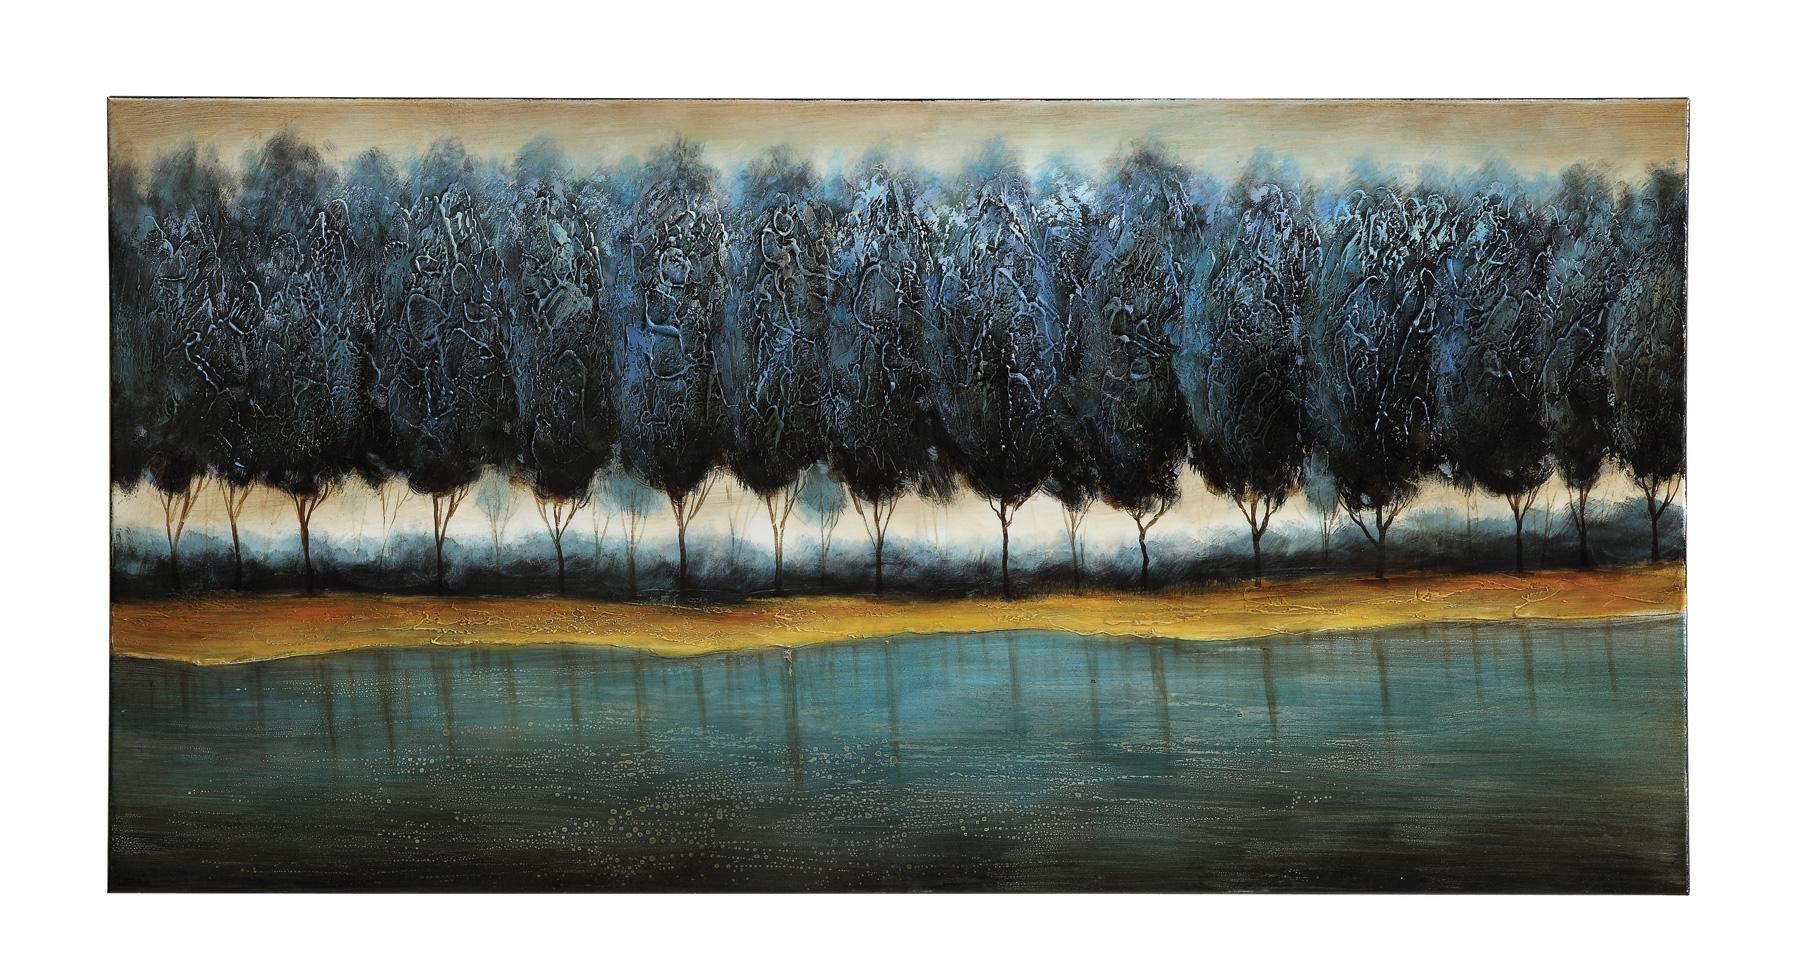 Coaster Wall Art Art - Item Number: 960713